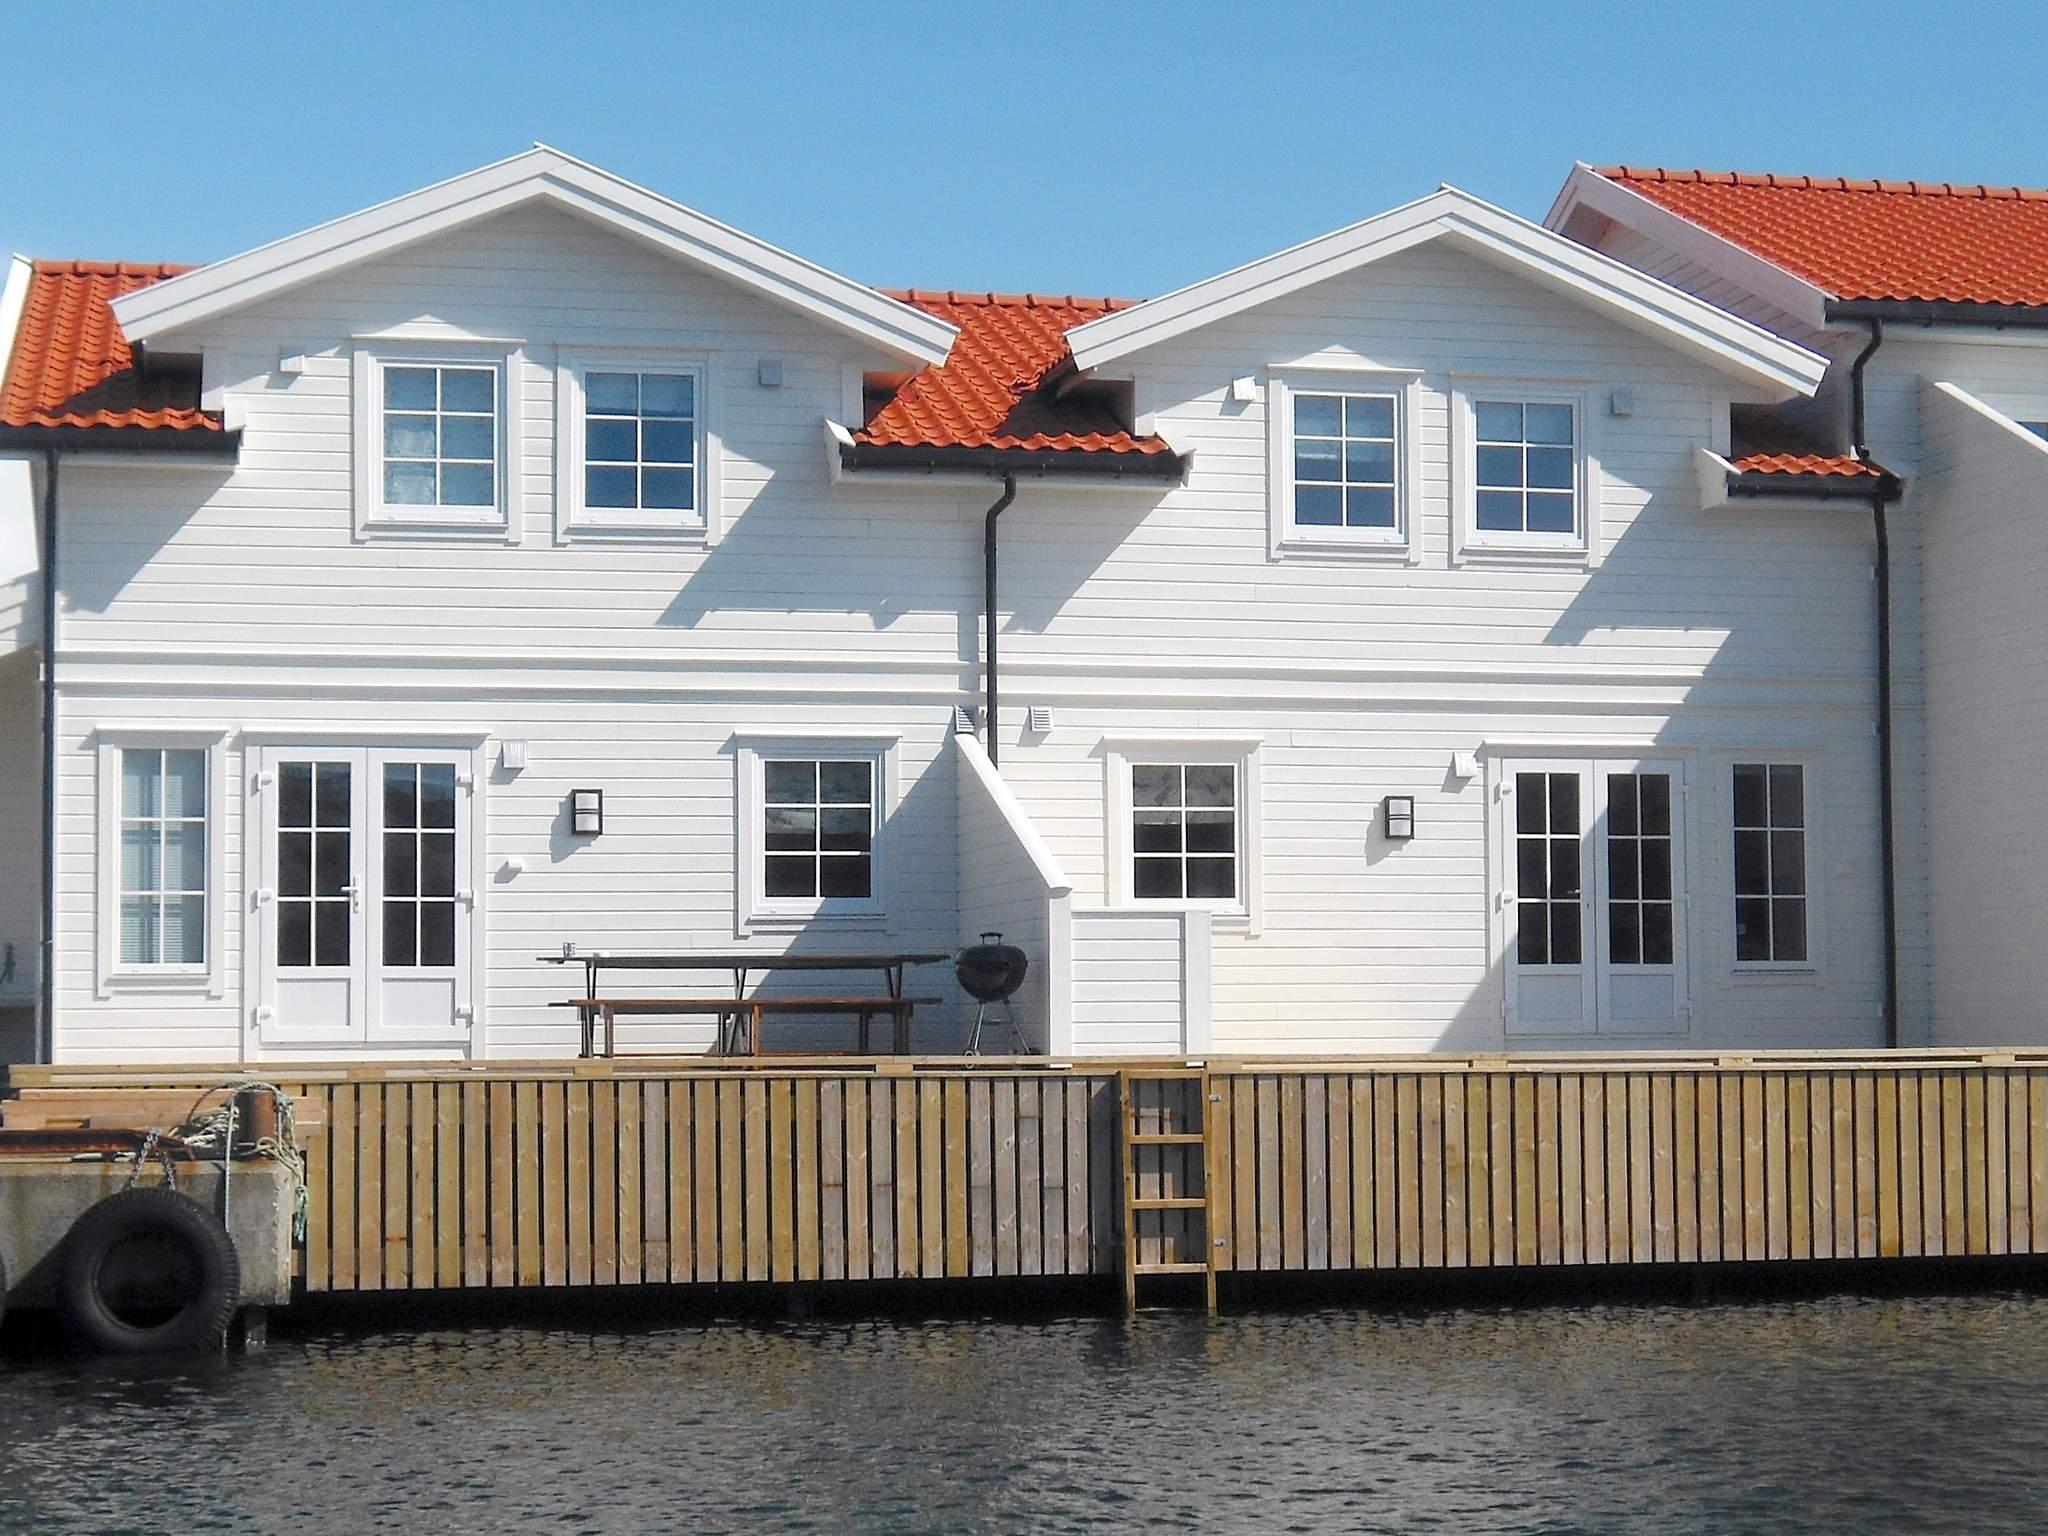 Ferienhaus Mølstrevåg (365129), Sveio, Hordaland - Hardangerfjord, Westnorwegen, Norwegen, Bild 12